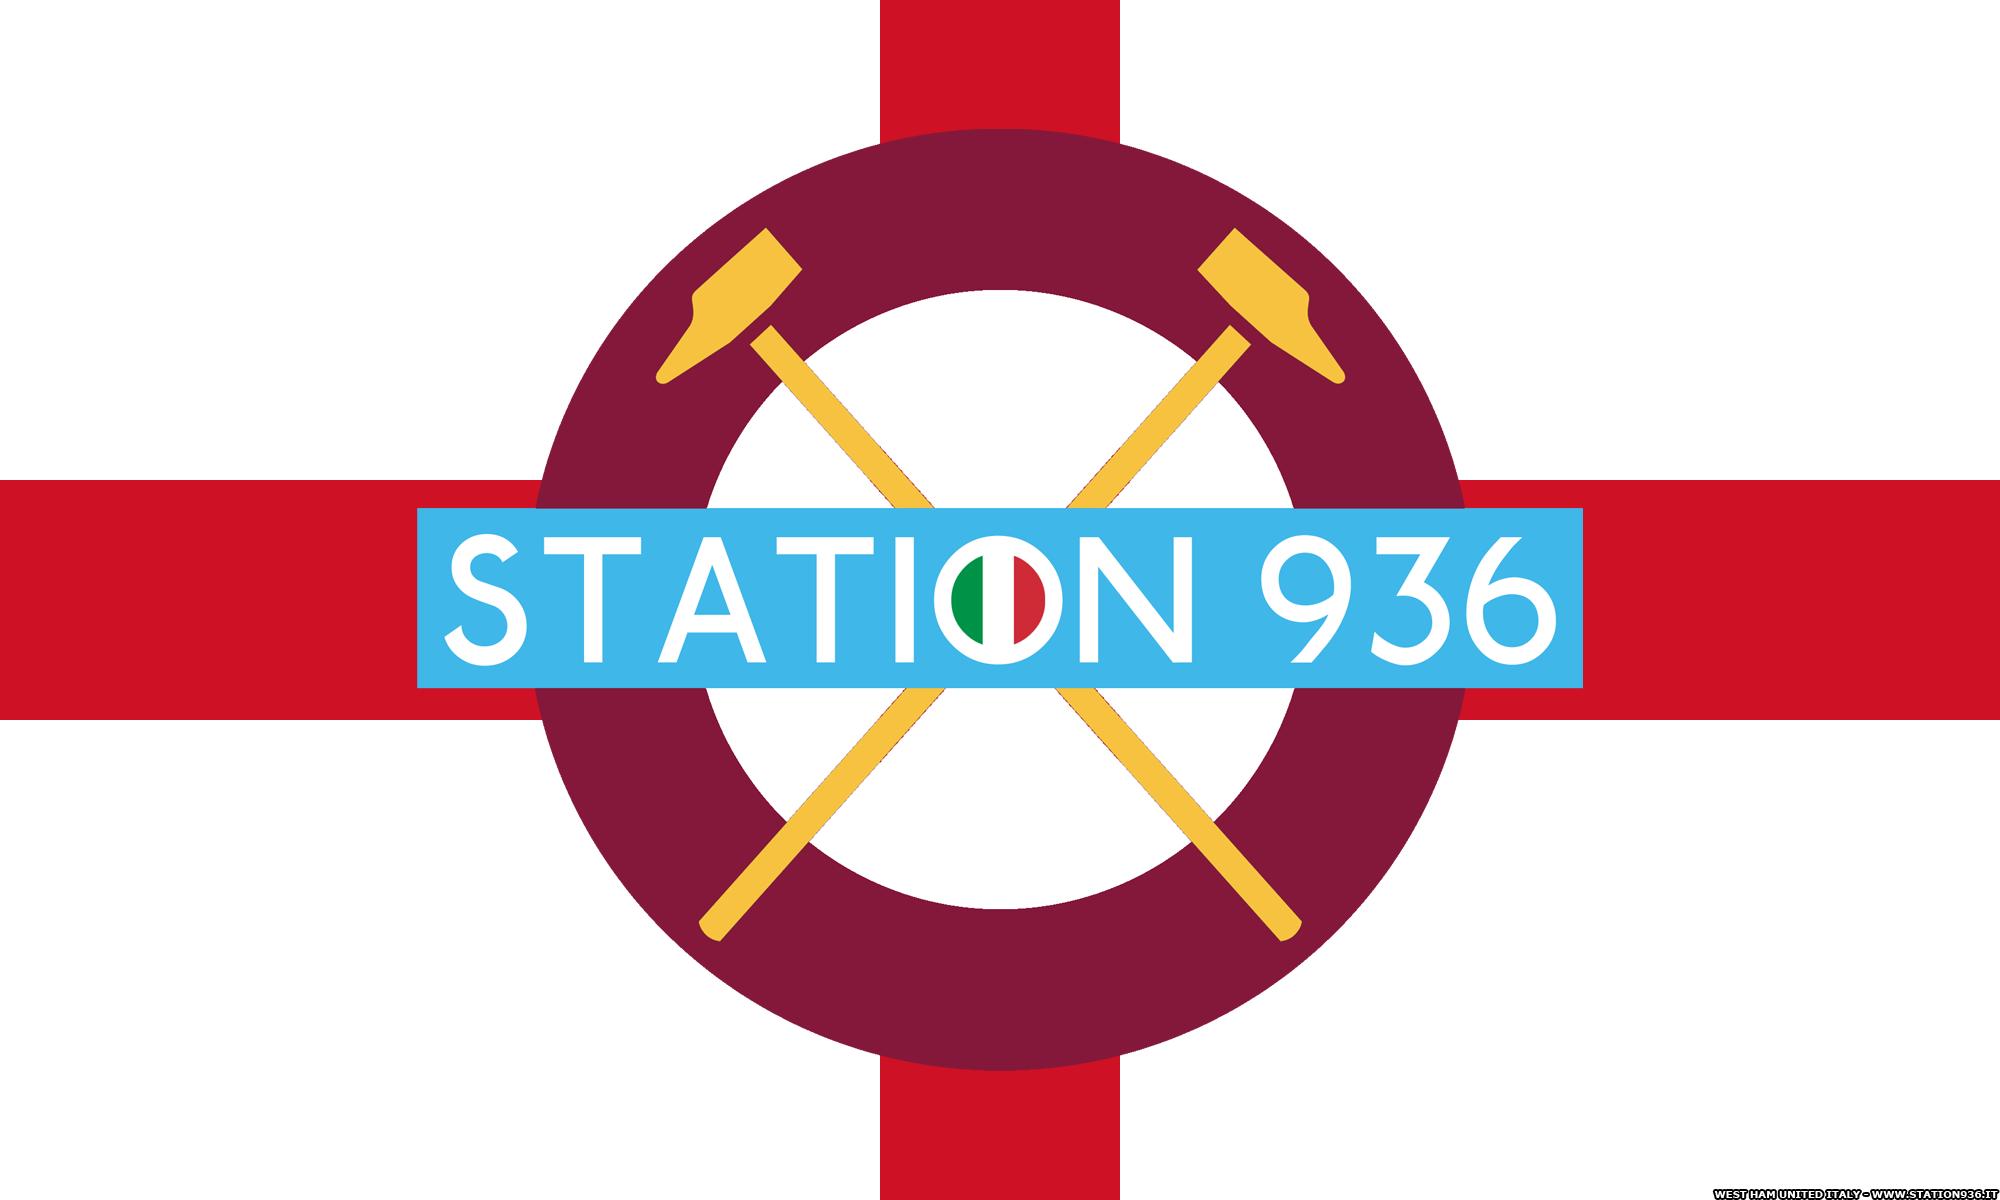 Logo Station 936 su bandiera inglese